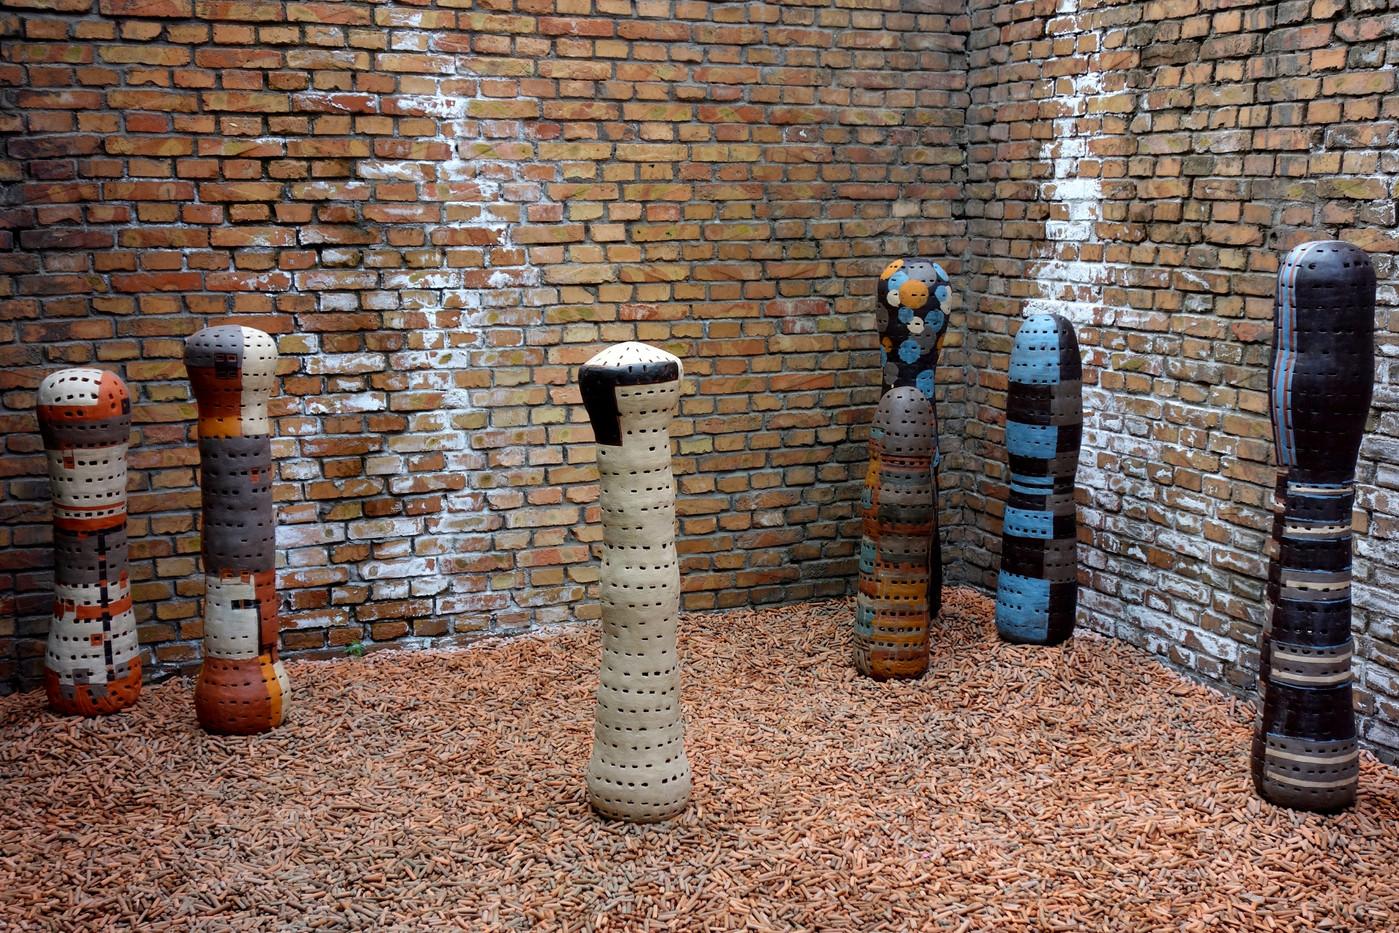 Fuping Indian Ceramic Museum, China